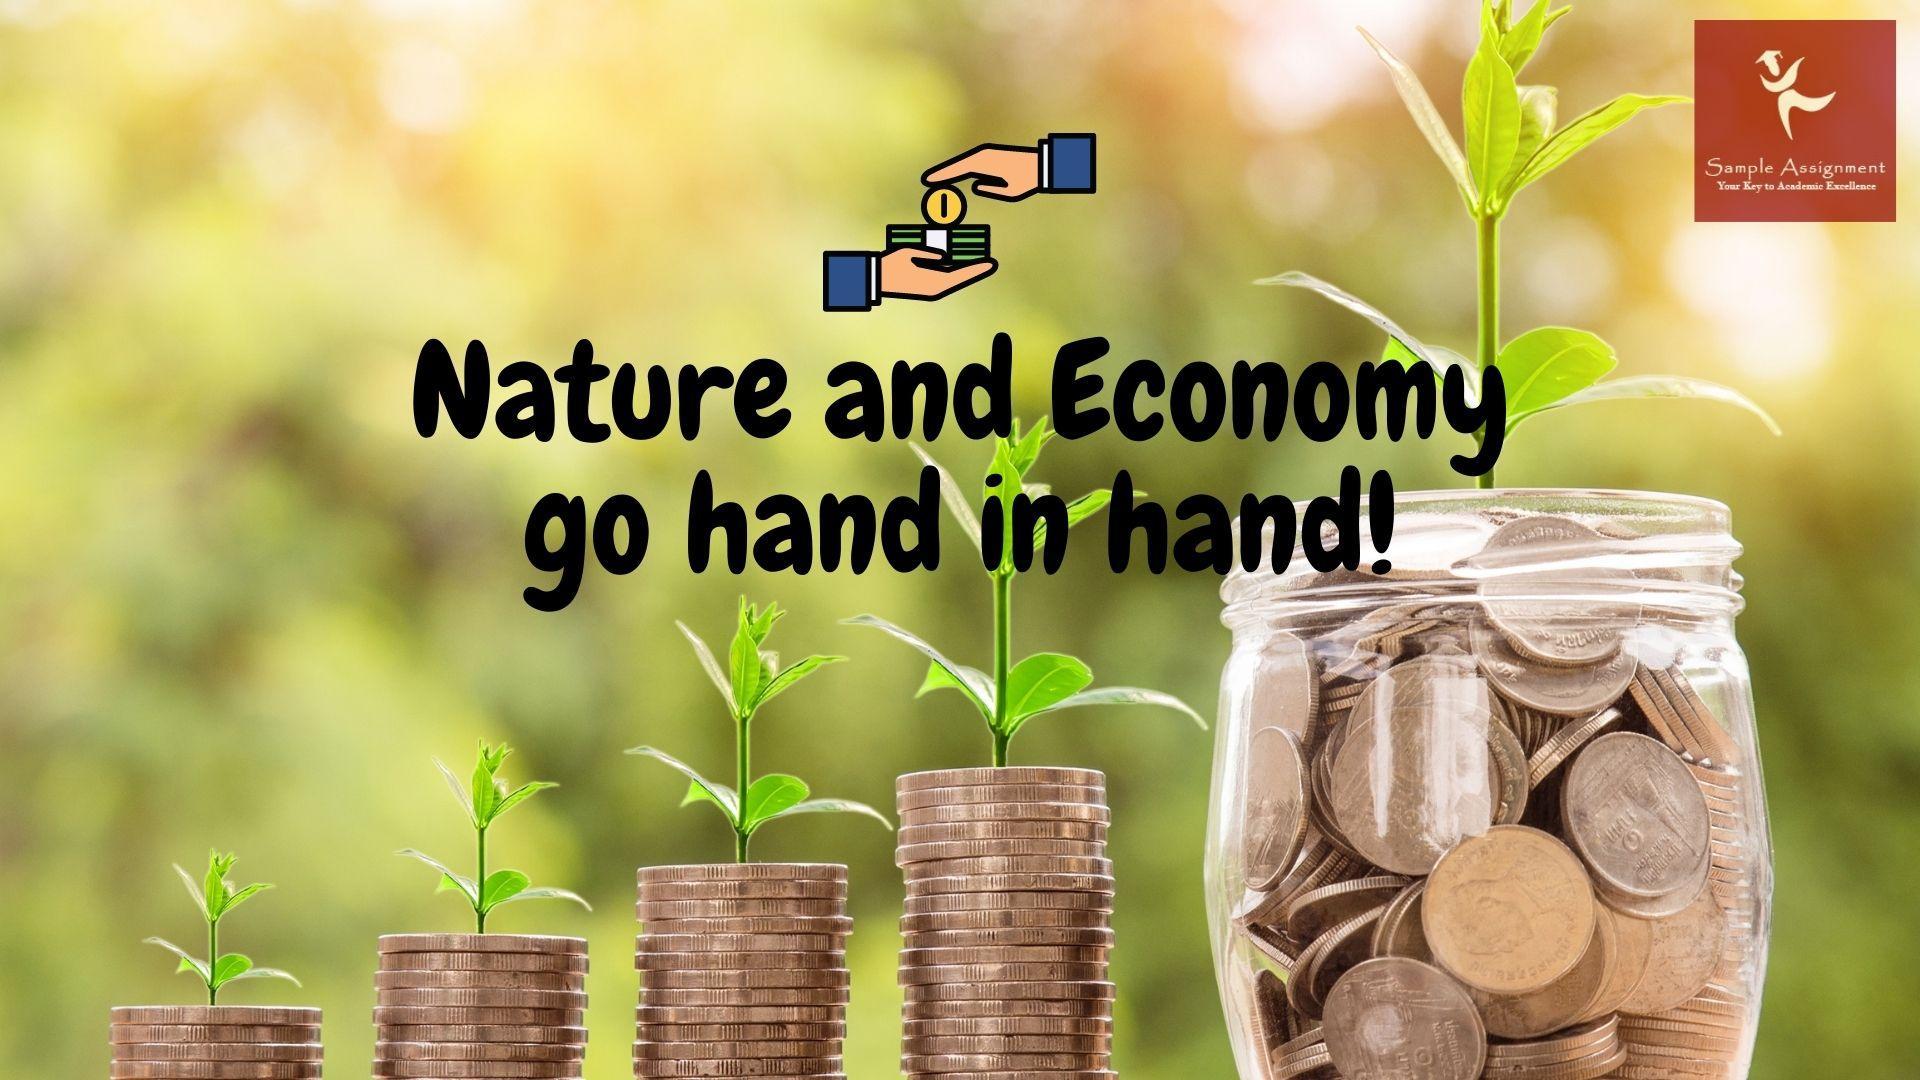 Forest Bioeconomy Sciences academic assistance through online tutoring